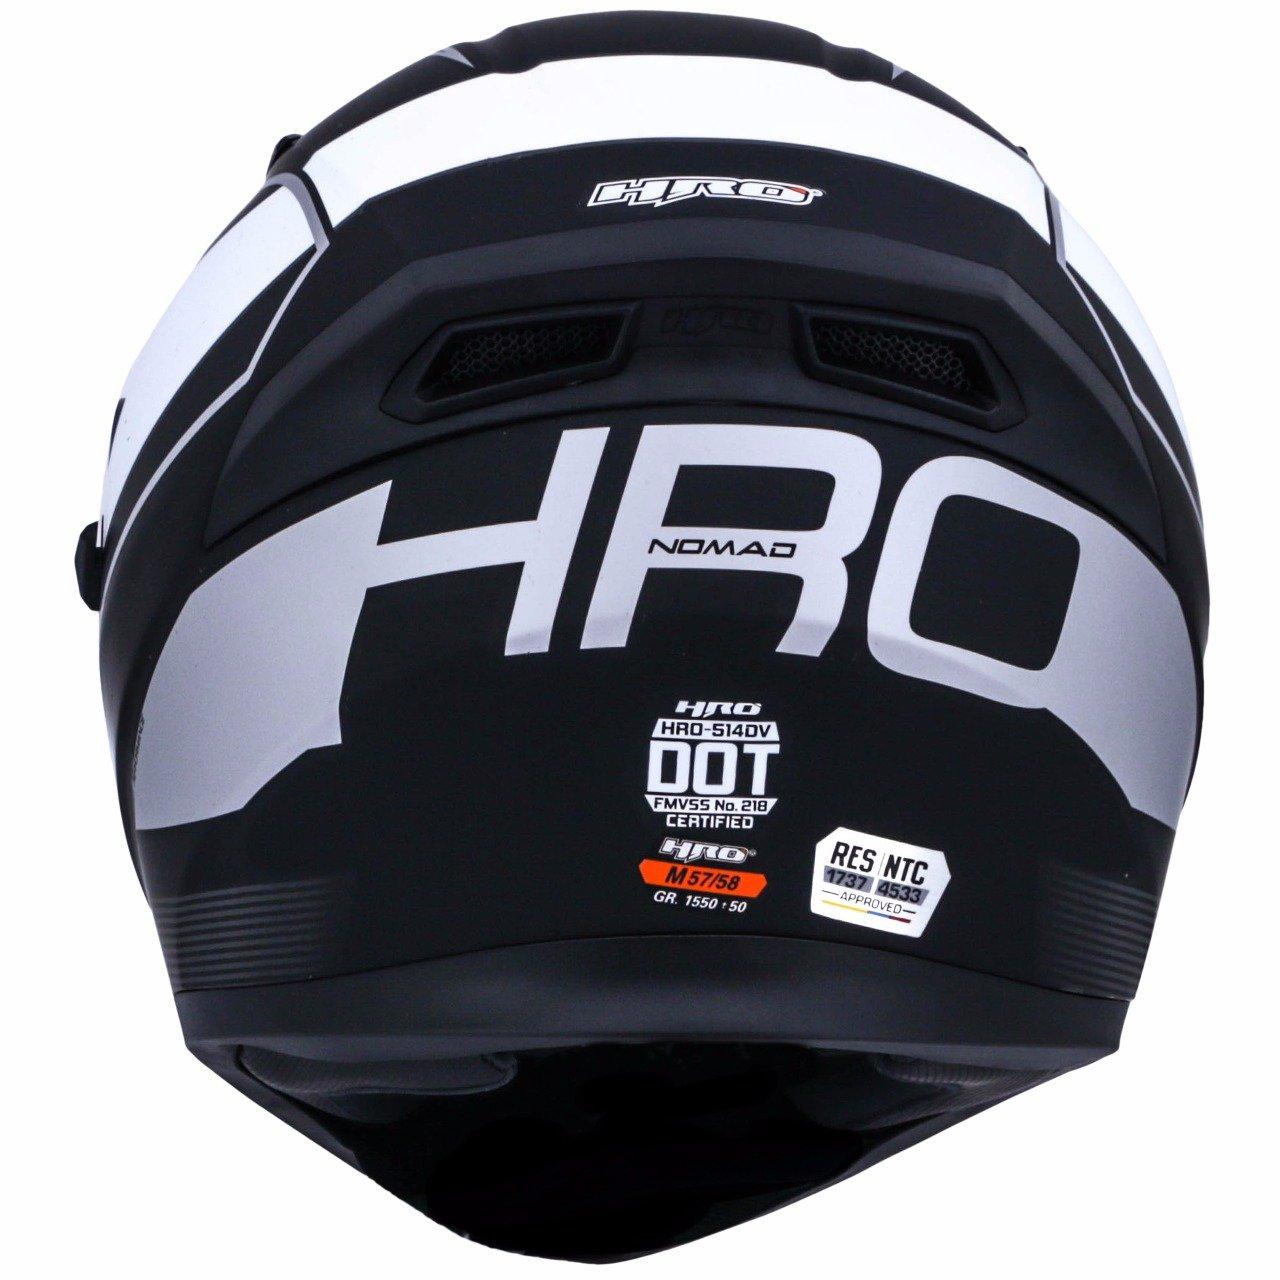 Amazon.es: HRO 514 profesional Motorcycle Racing Casco. 2 viseras - diseño elegante - proteger su vida + Awesome Bonus: libre D2D aventura pasamontañas.